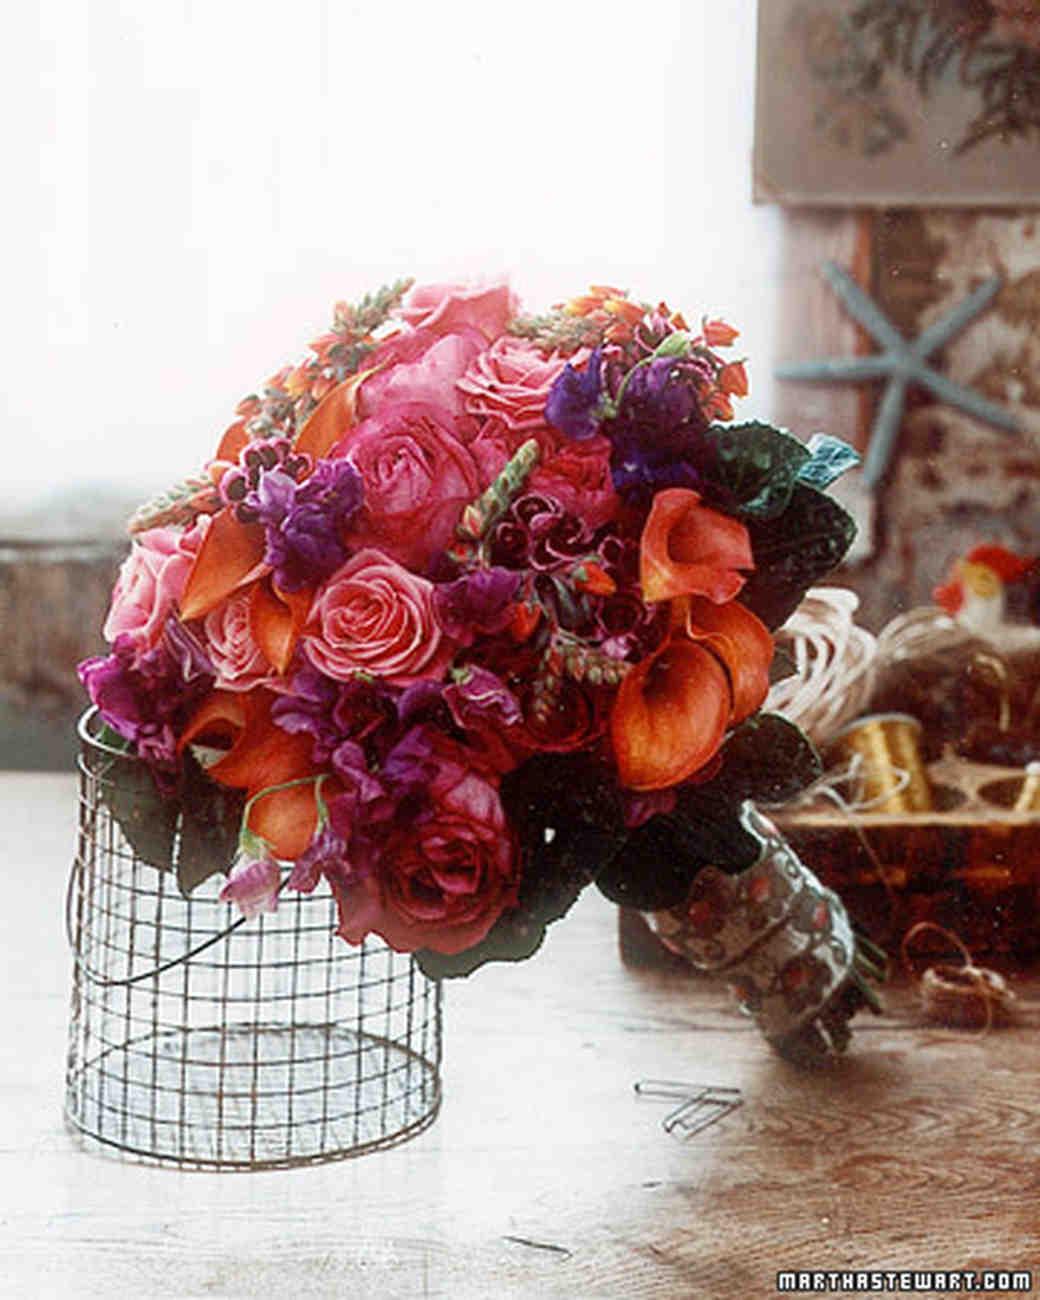 Bouquets with Old World Charm | Martha Stewart Weddings